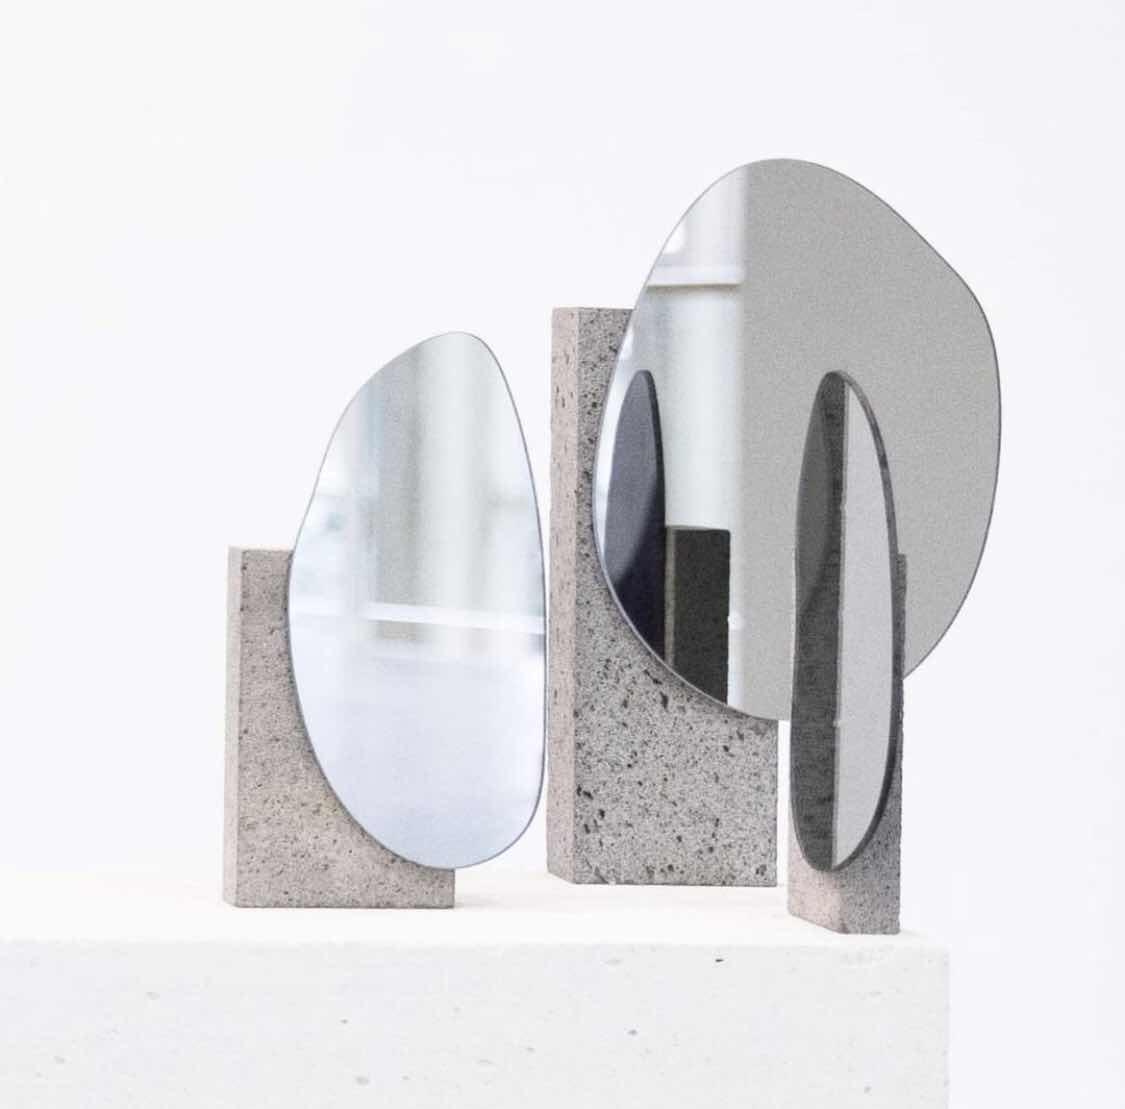 STYX Mirrors